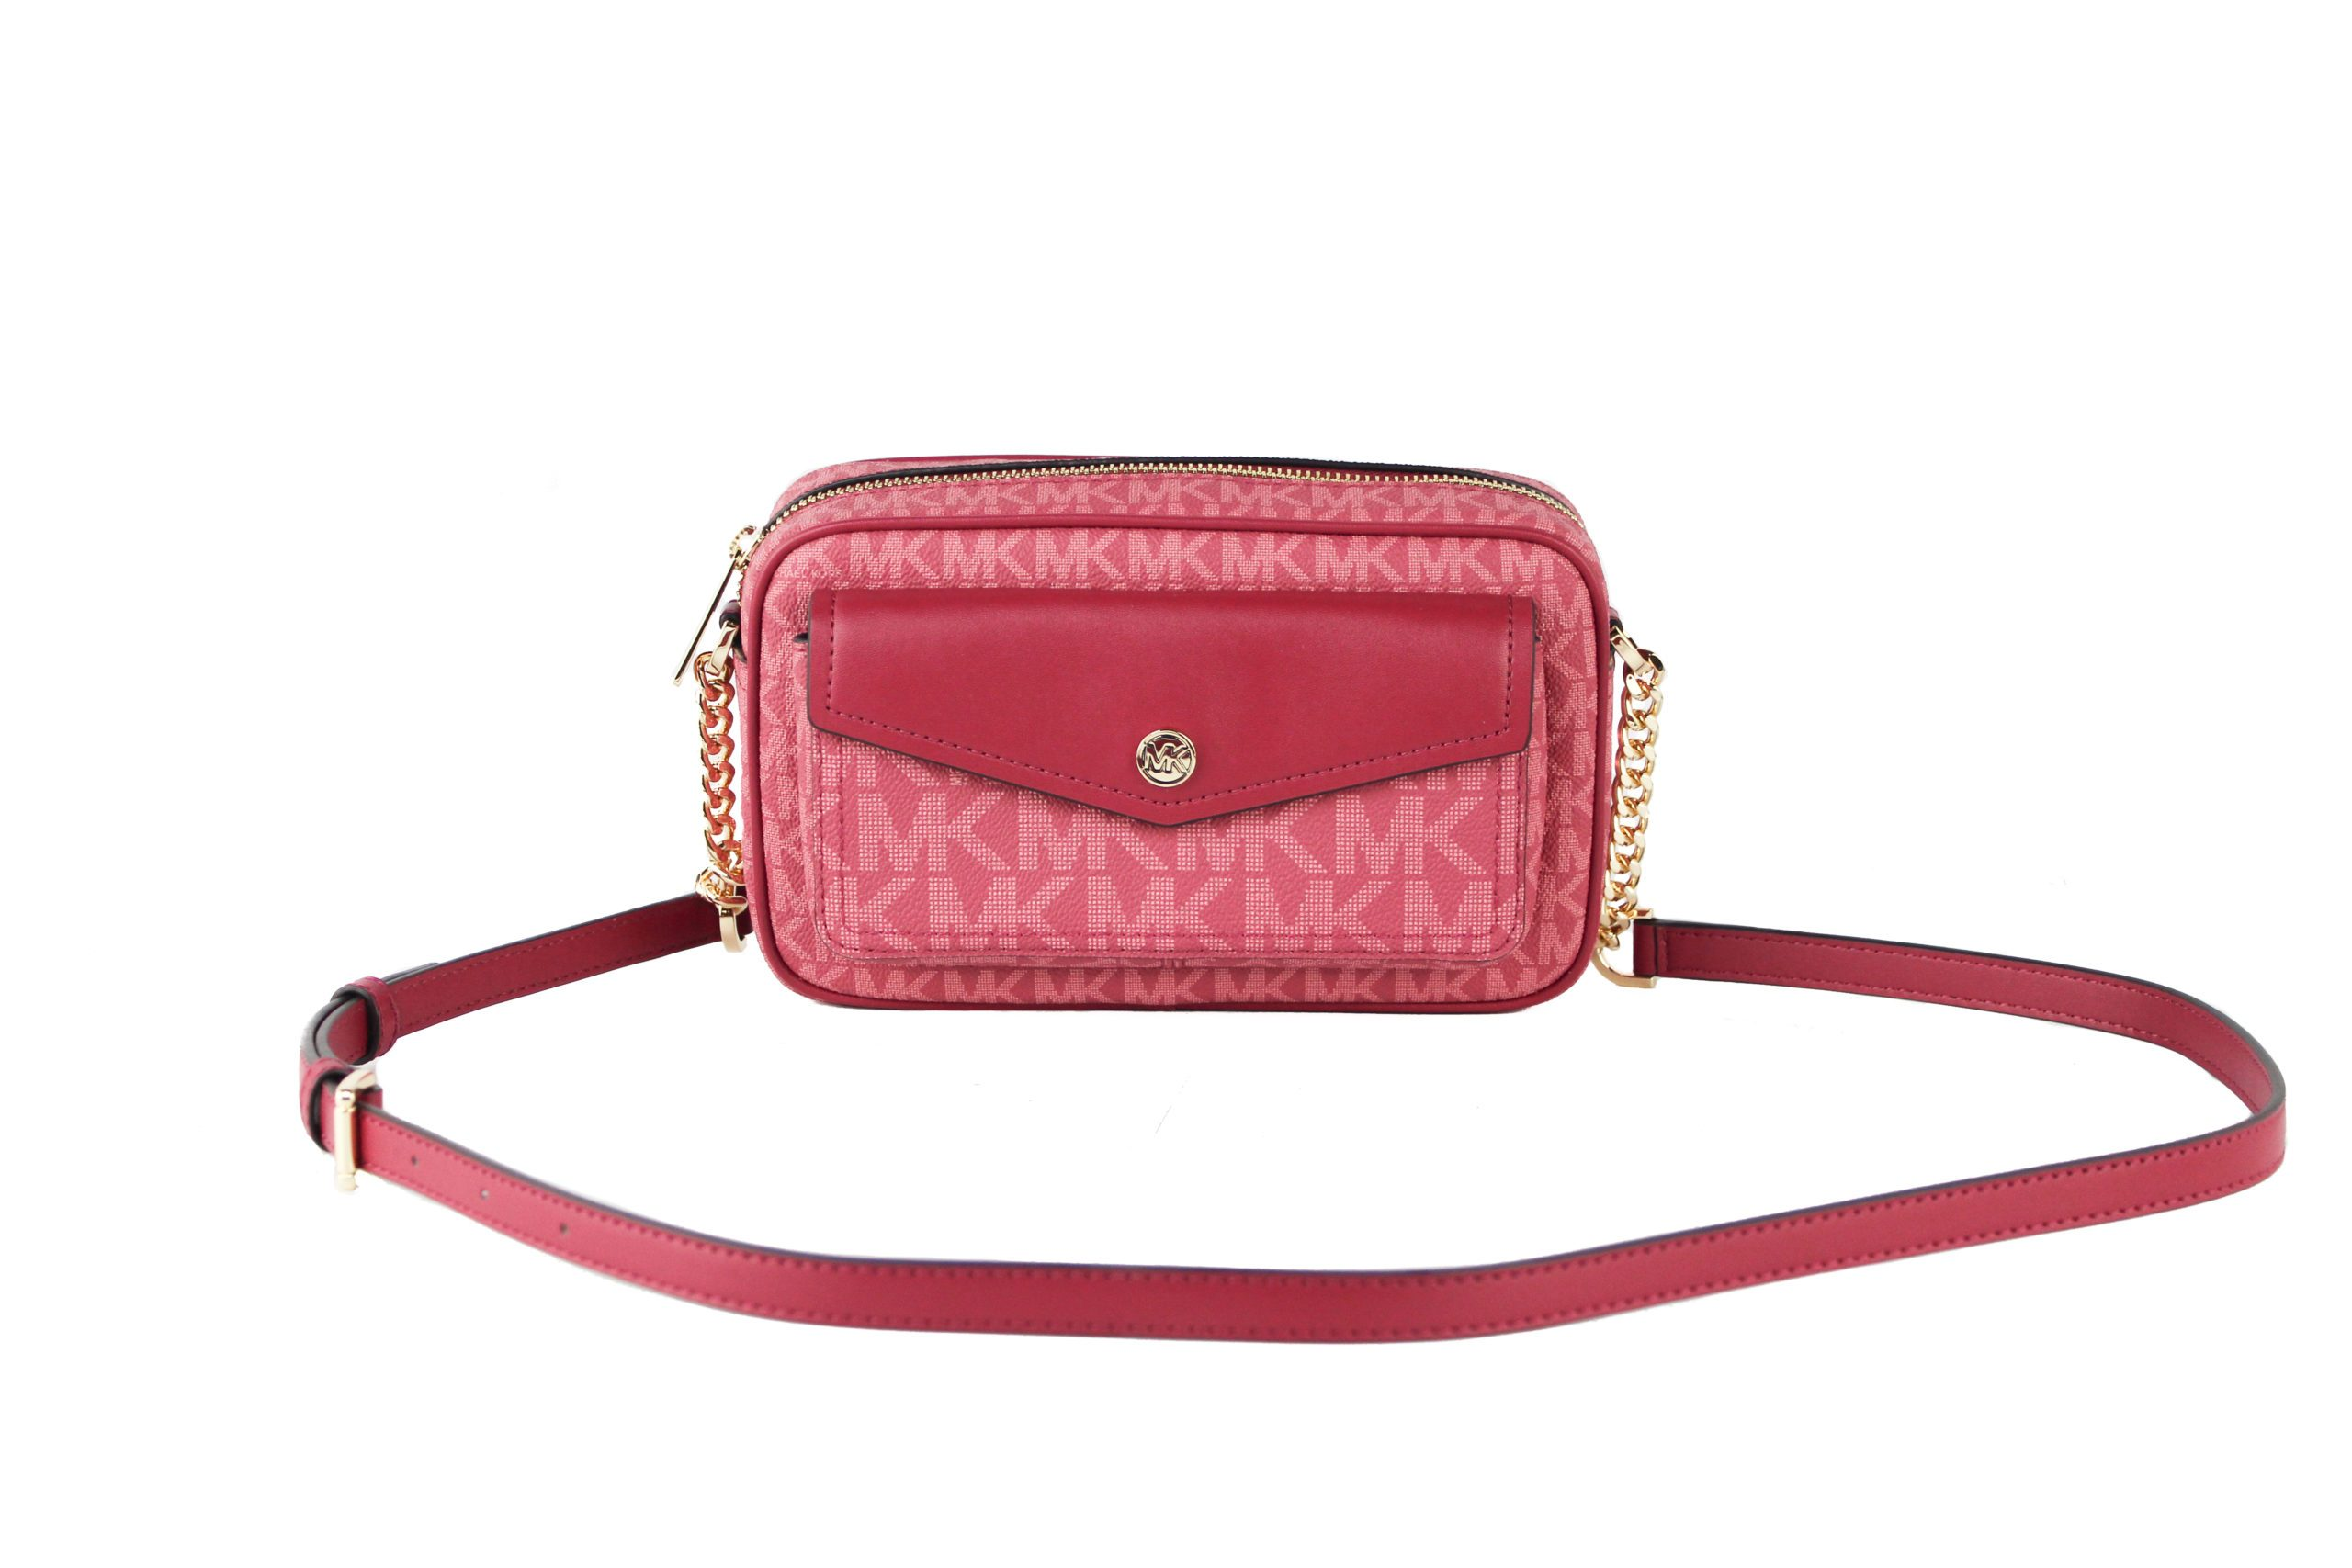 Jet Set Travel Medium Signature PVC Pocket Camera Bag Crossbody Handbag (Berry Multi Signature)